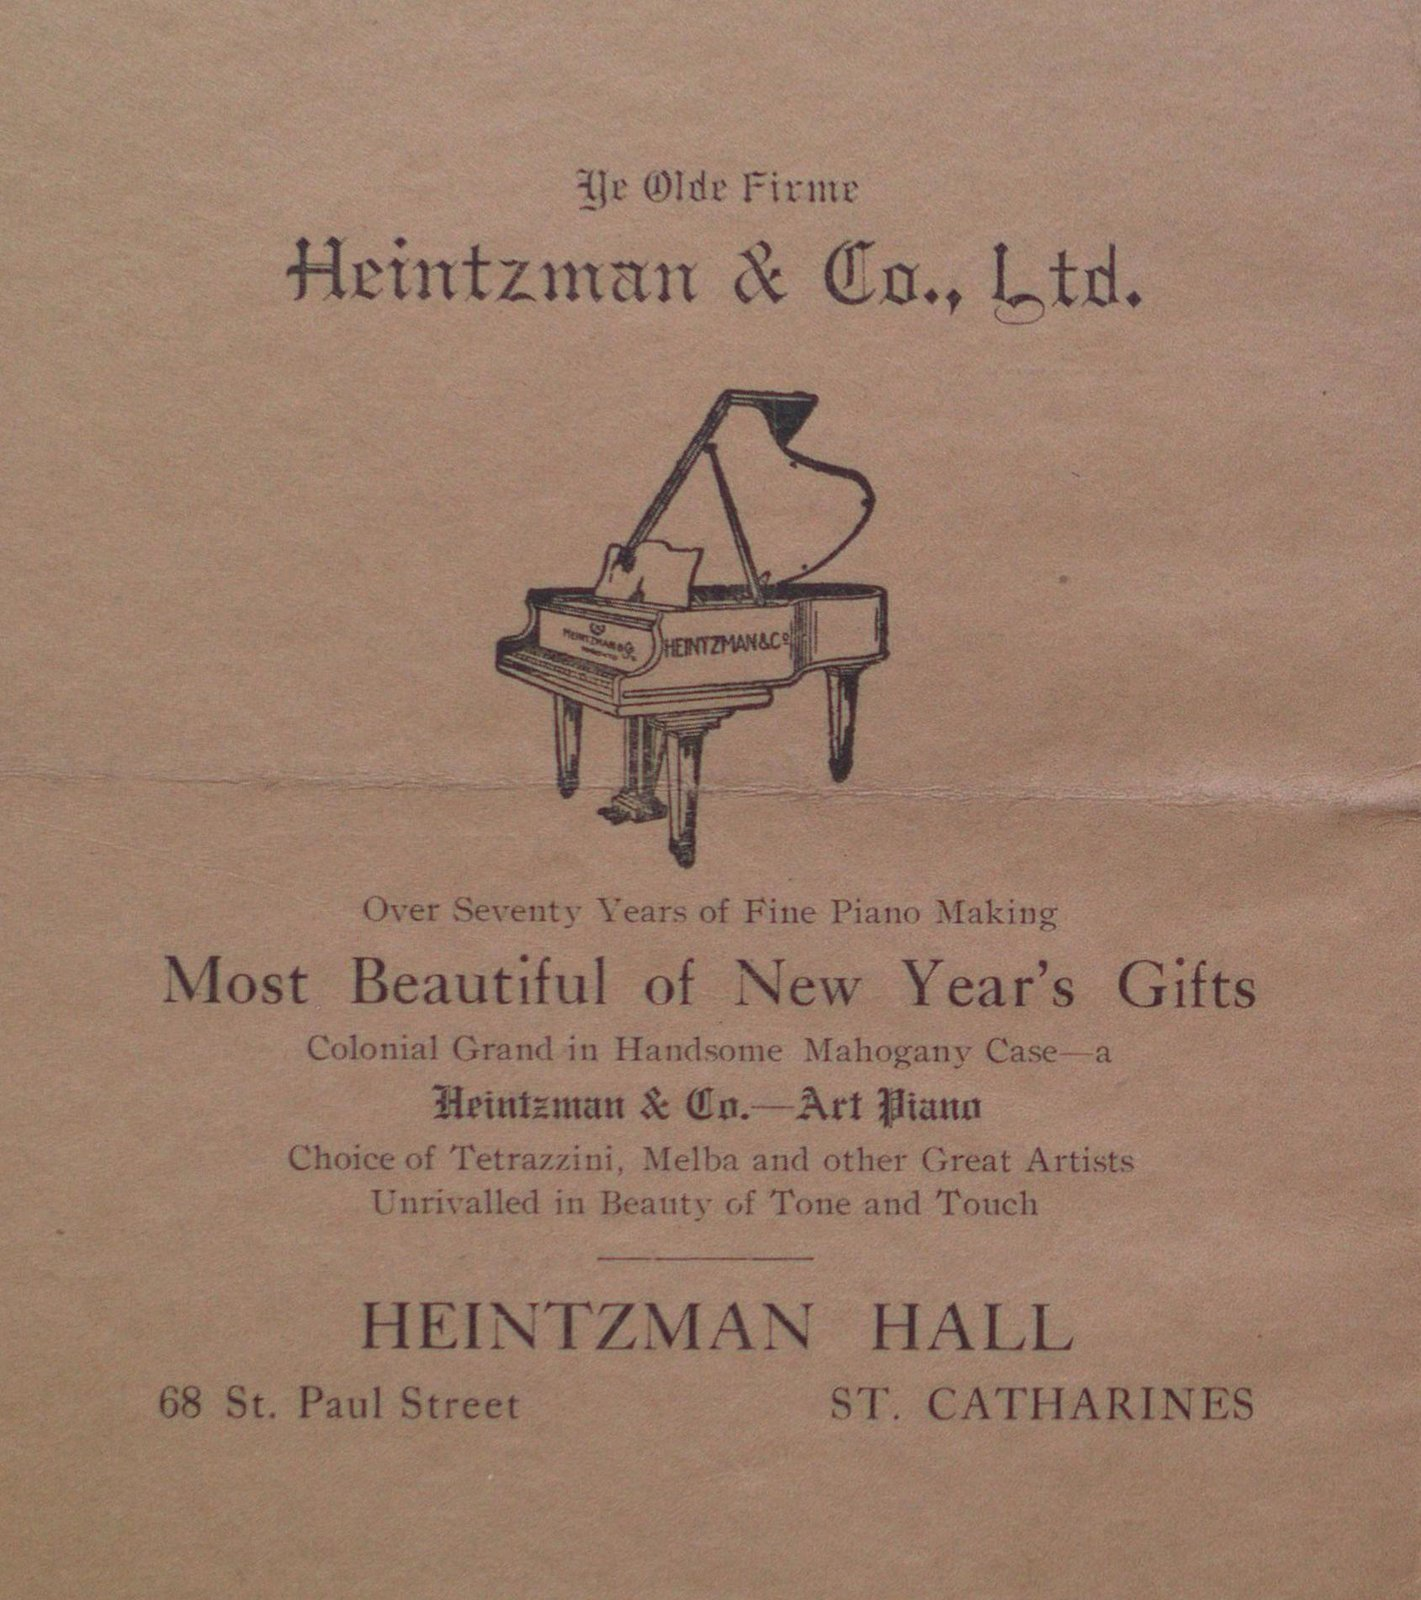 Teresa Vanderburgh's Musical Scrapbook #2 - St. Catharines Musical Association Program